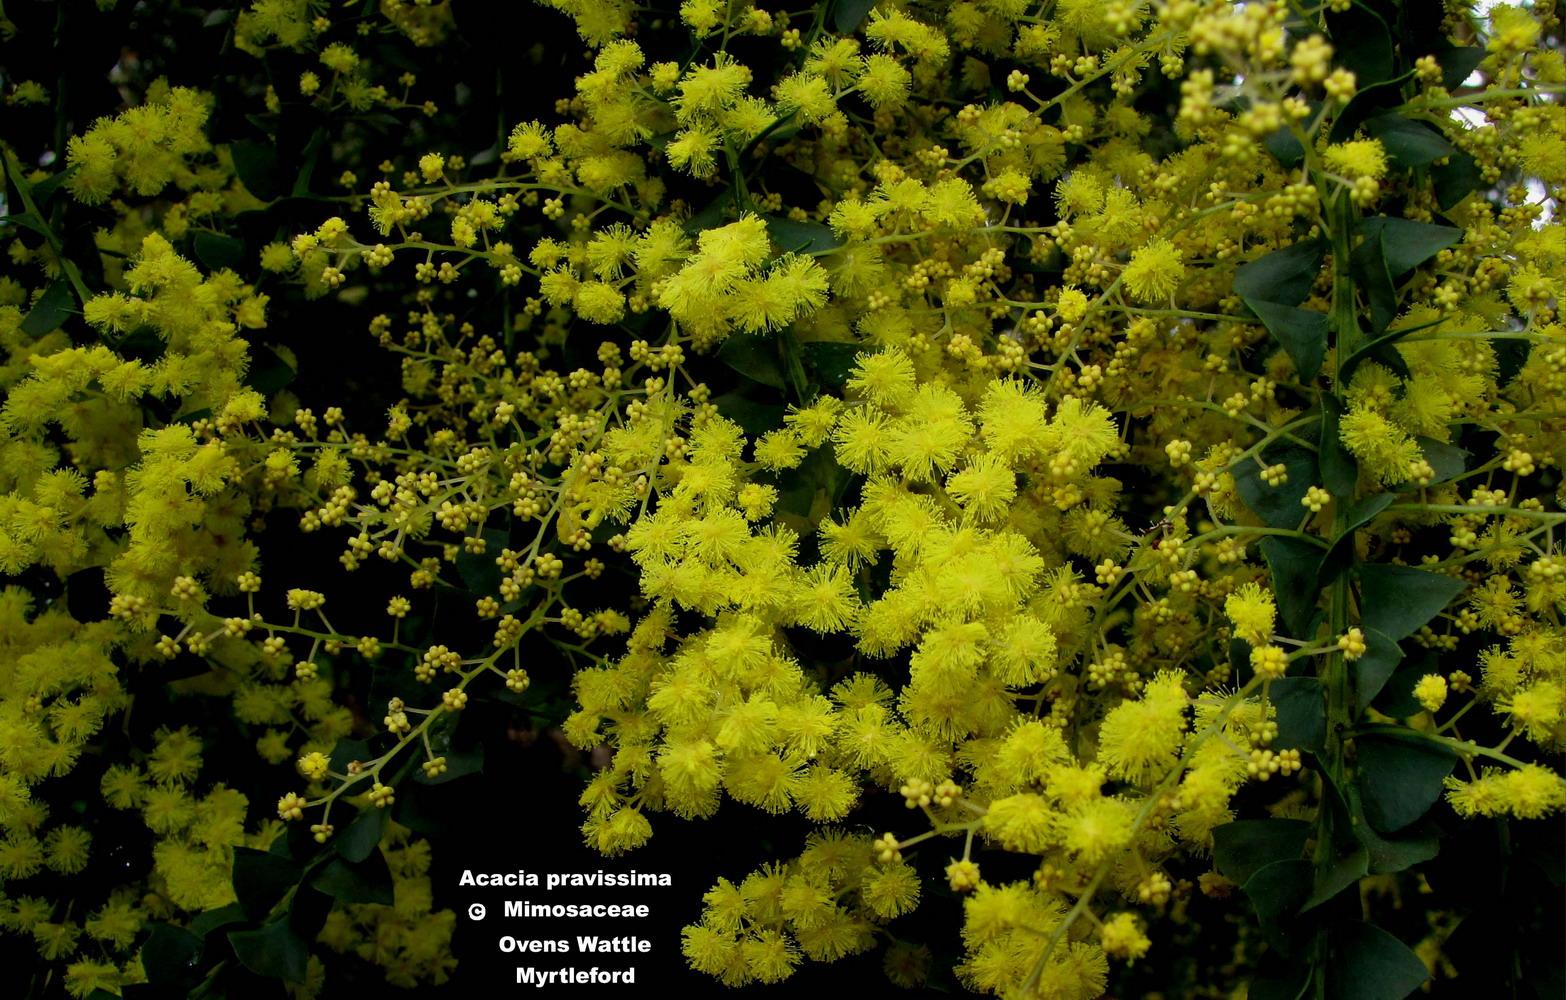 Acacia pravissima flora ALA source